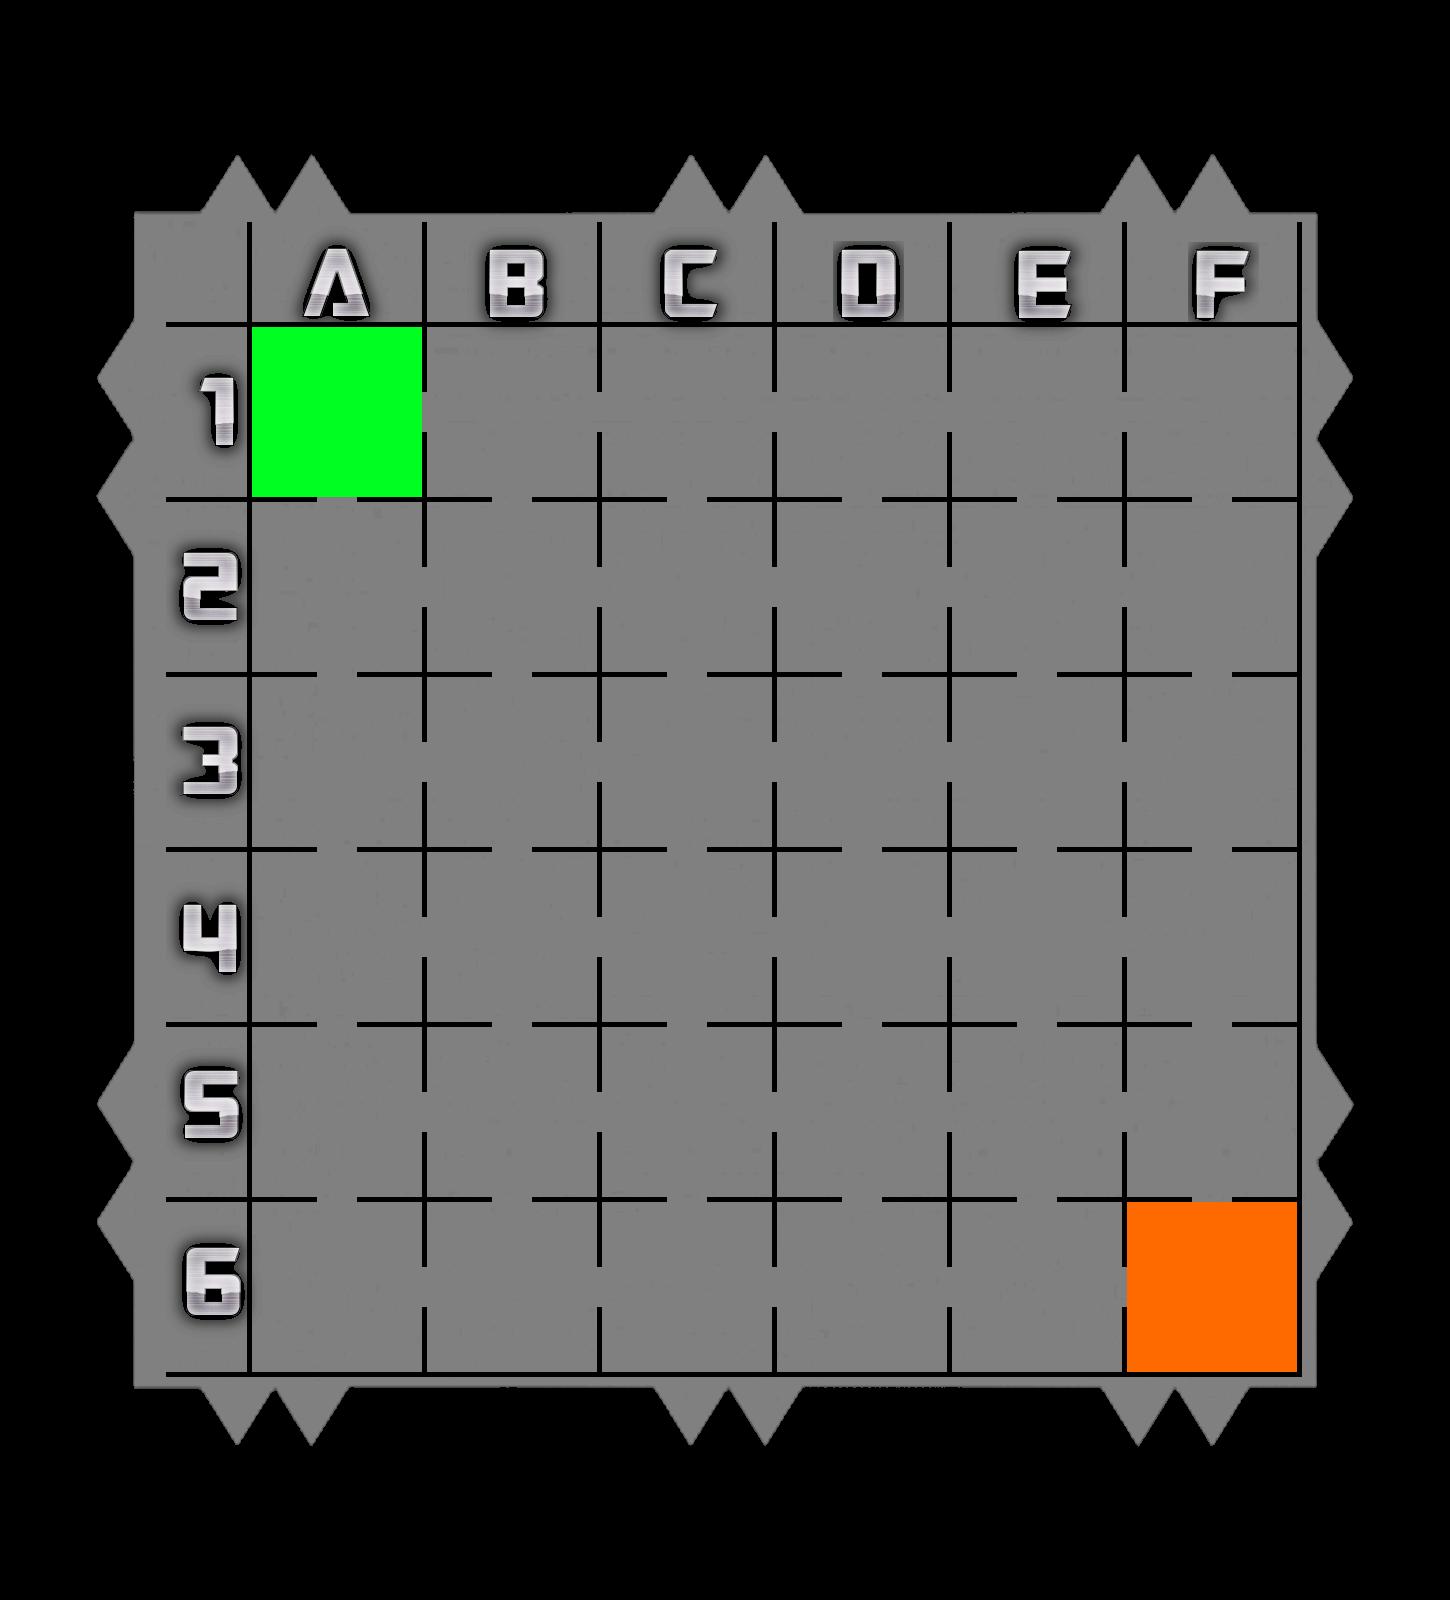 board_empty_2.png.28c0e5da7d82dddfd130a9d031666125.png